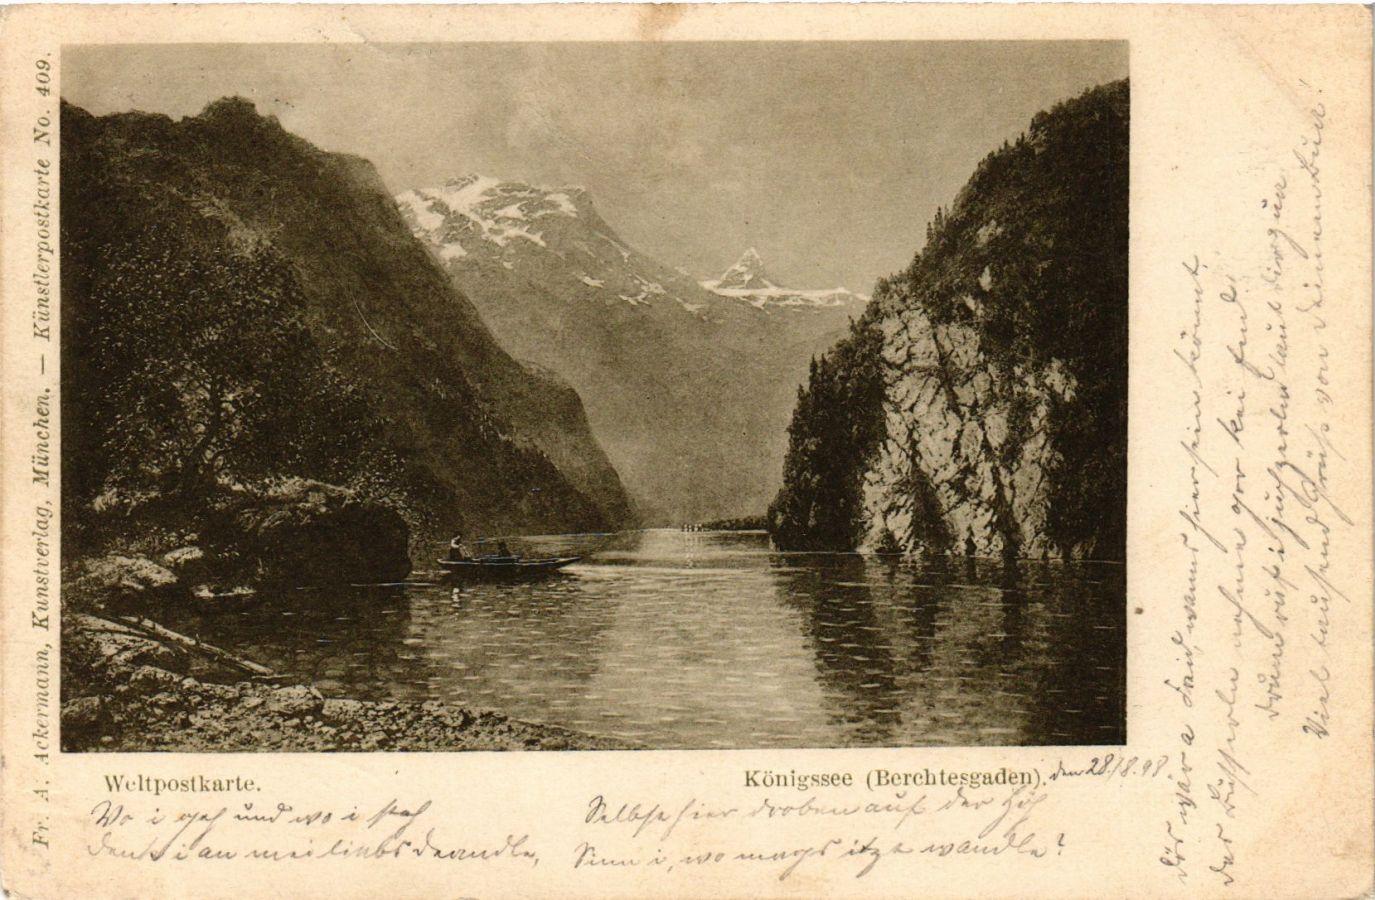 CPA-AK-Konigssee-Berchtesgaden-GERMANY-878875